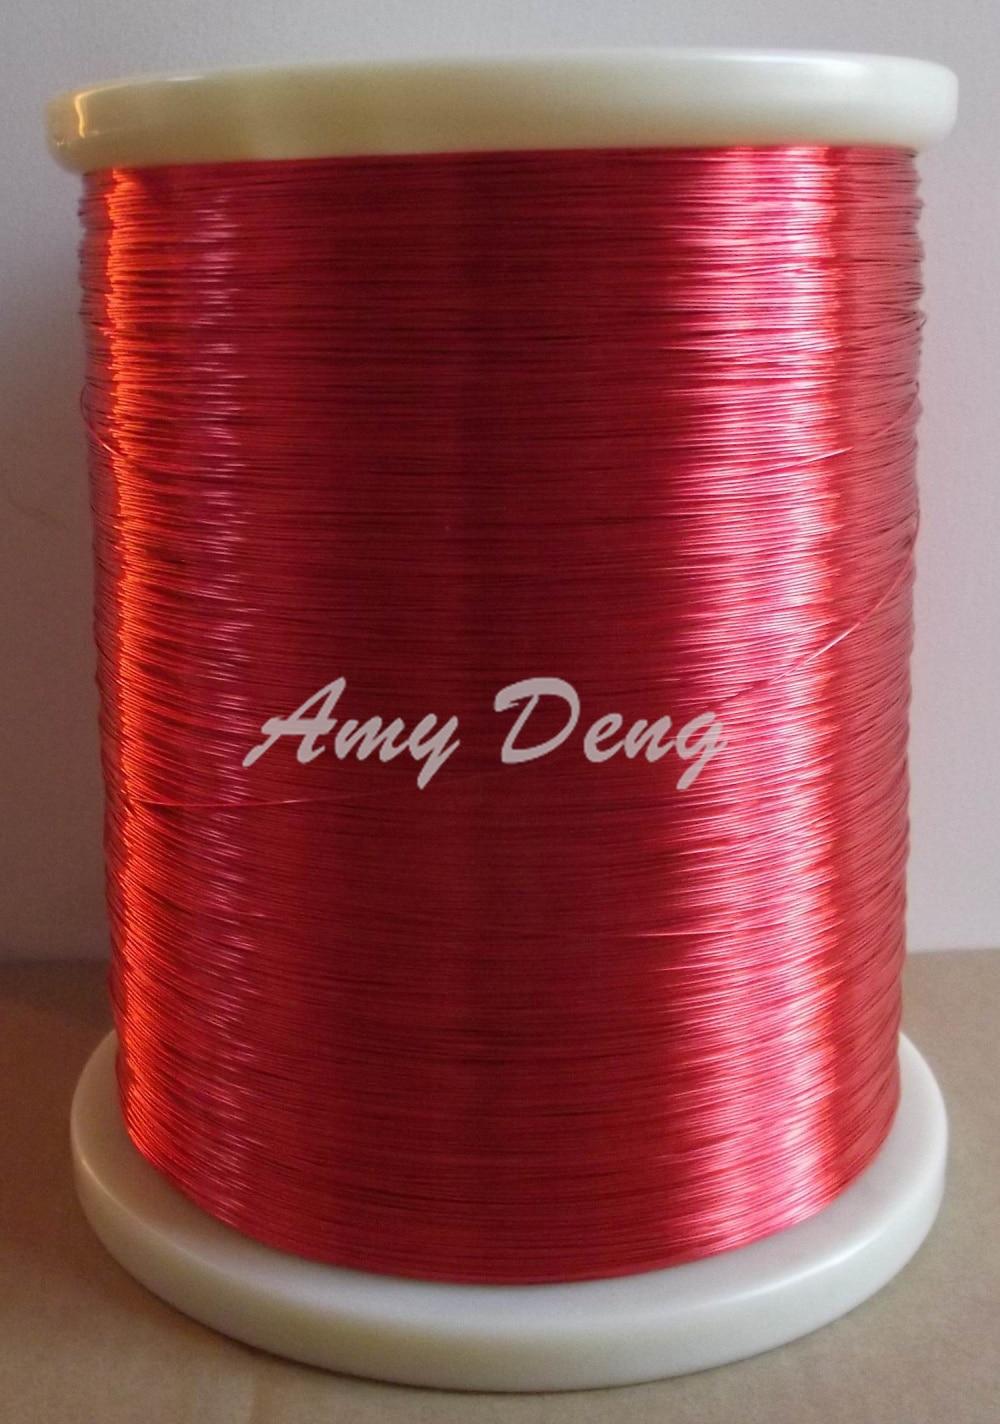 1000gram/lot  0.4 mm (red) new polyurethane enamel covered wire 2UEW QA-1-155